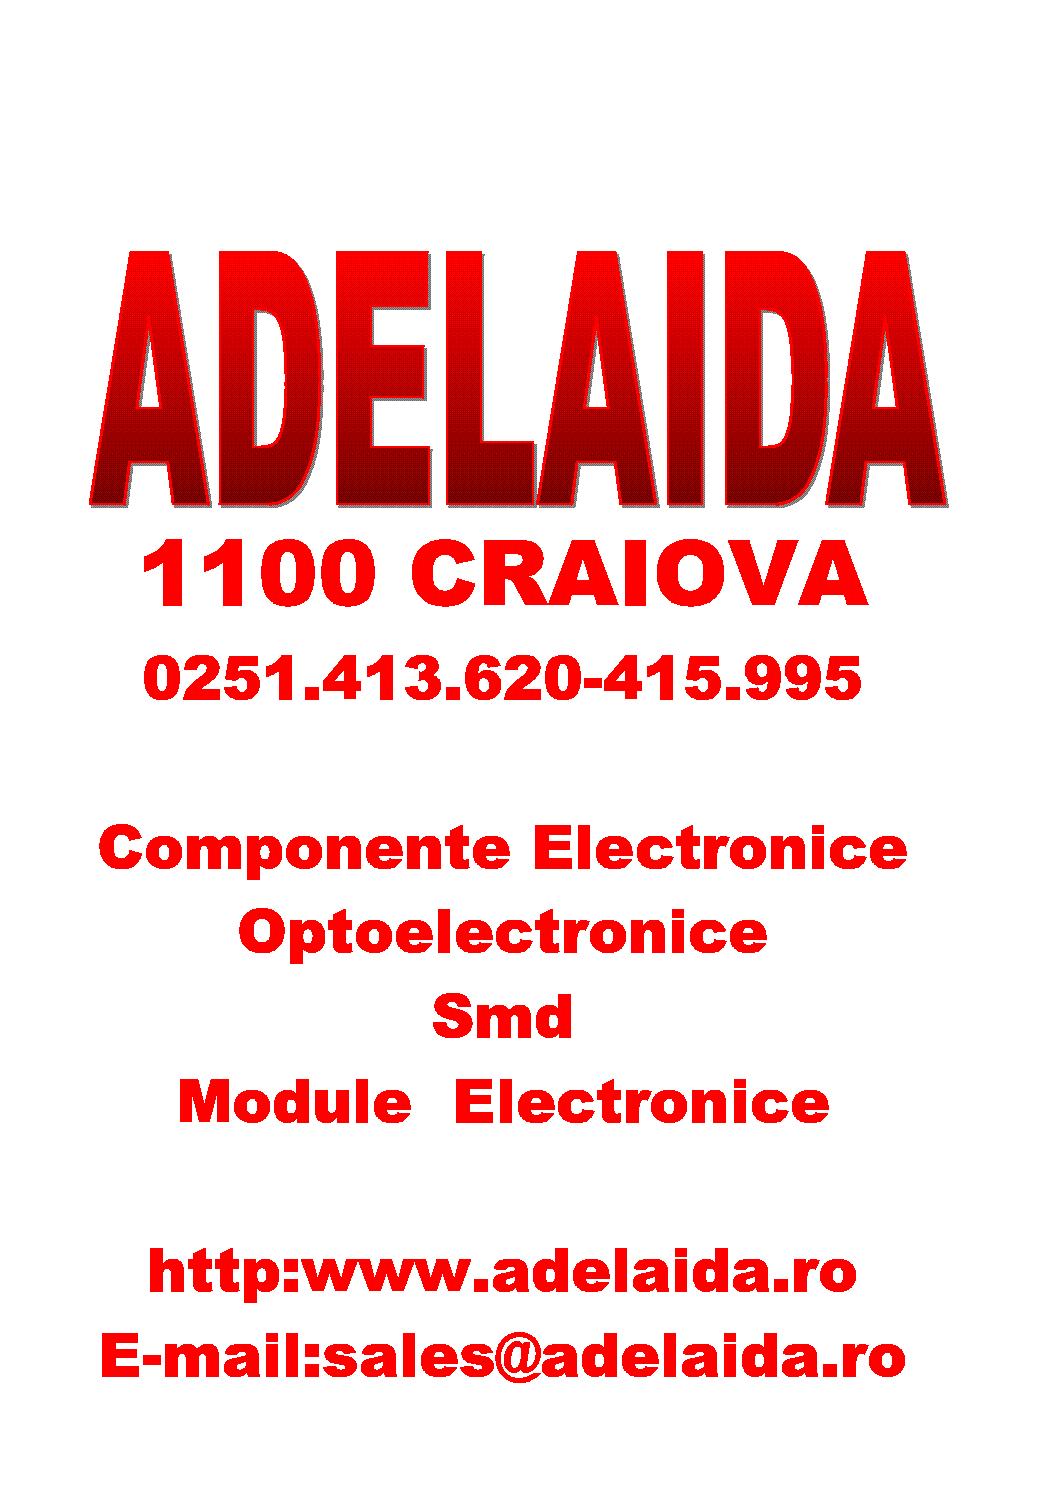 Samsung V260 B1 C03 Cm1671a Tps65161 Hx8904 Lm324 Lg 26lg7 T Con Sch Lcd Tv Schematic Diagram Http Elektrotanyacom Bekotelchassis127 Ck5385